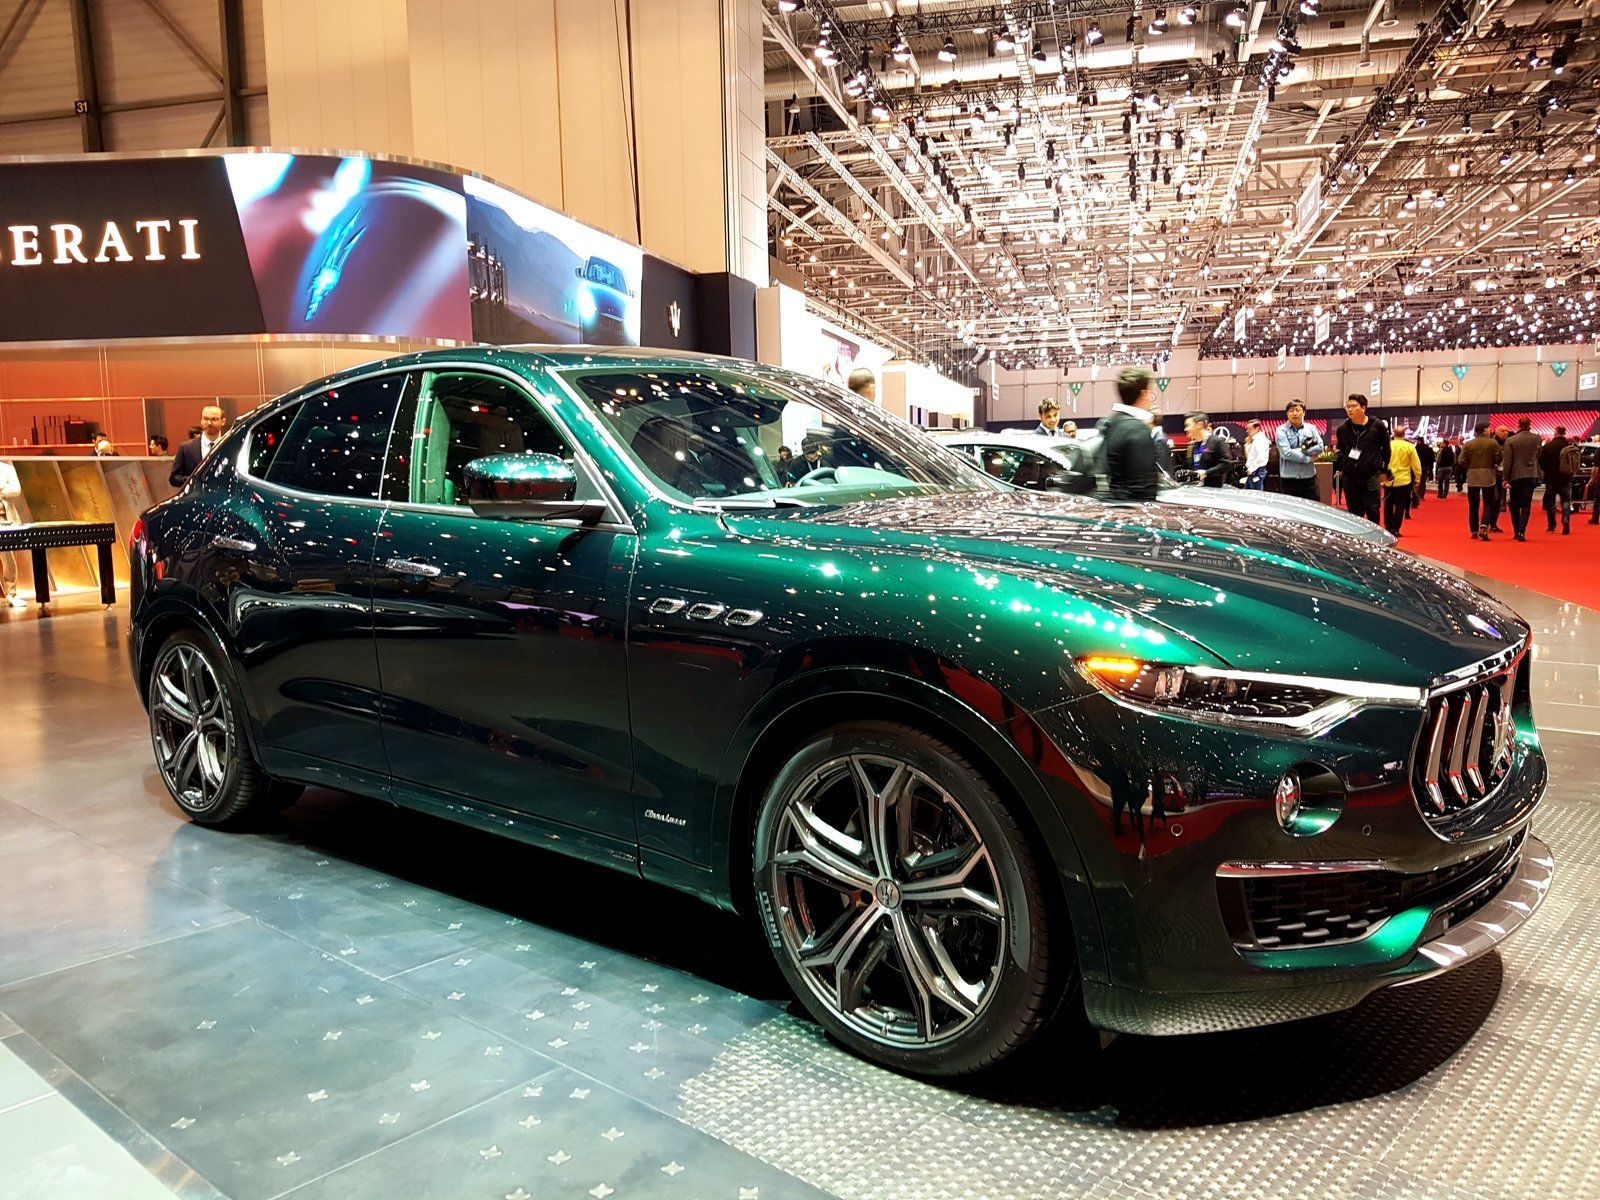 2019 Maserati Levante One Of One Allegra Antinori Pictures